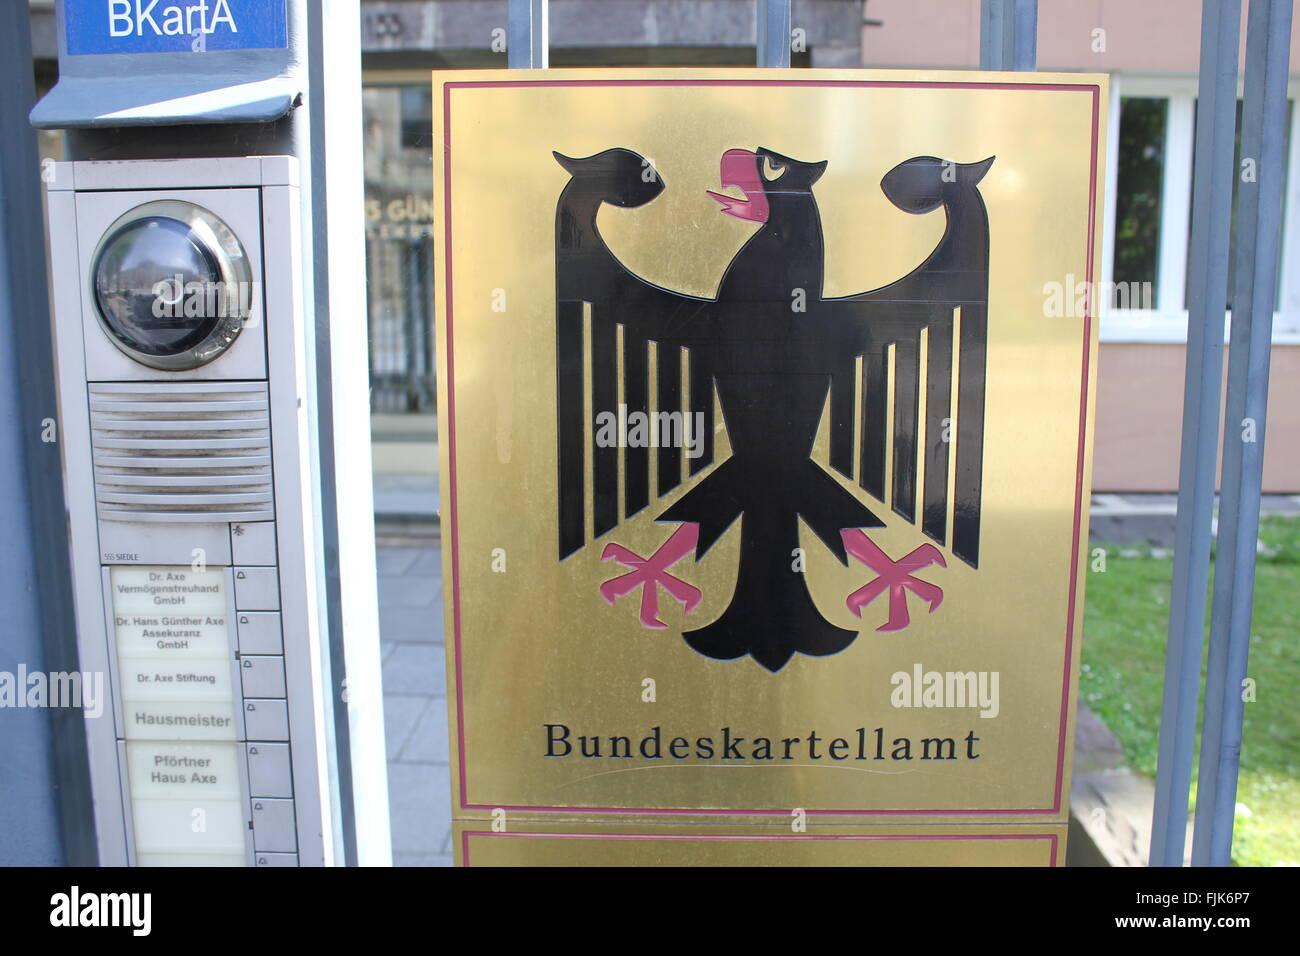 Il Bundeskartellamt, 'Bundeskartelamt', a Bonn Germania Immagini Stock